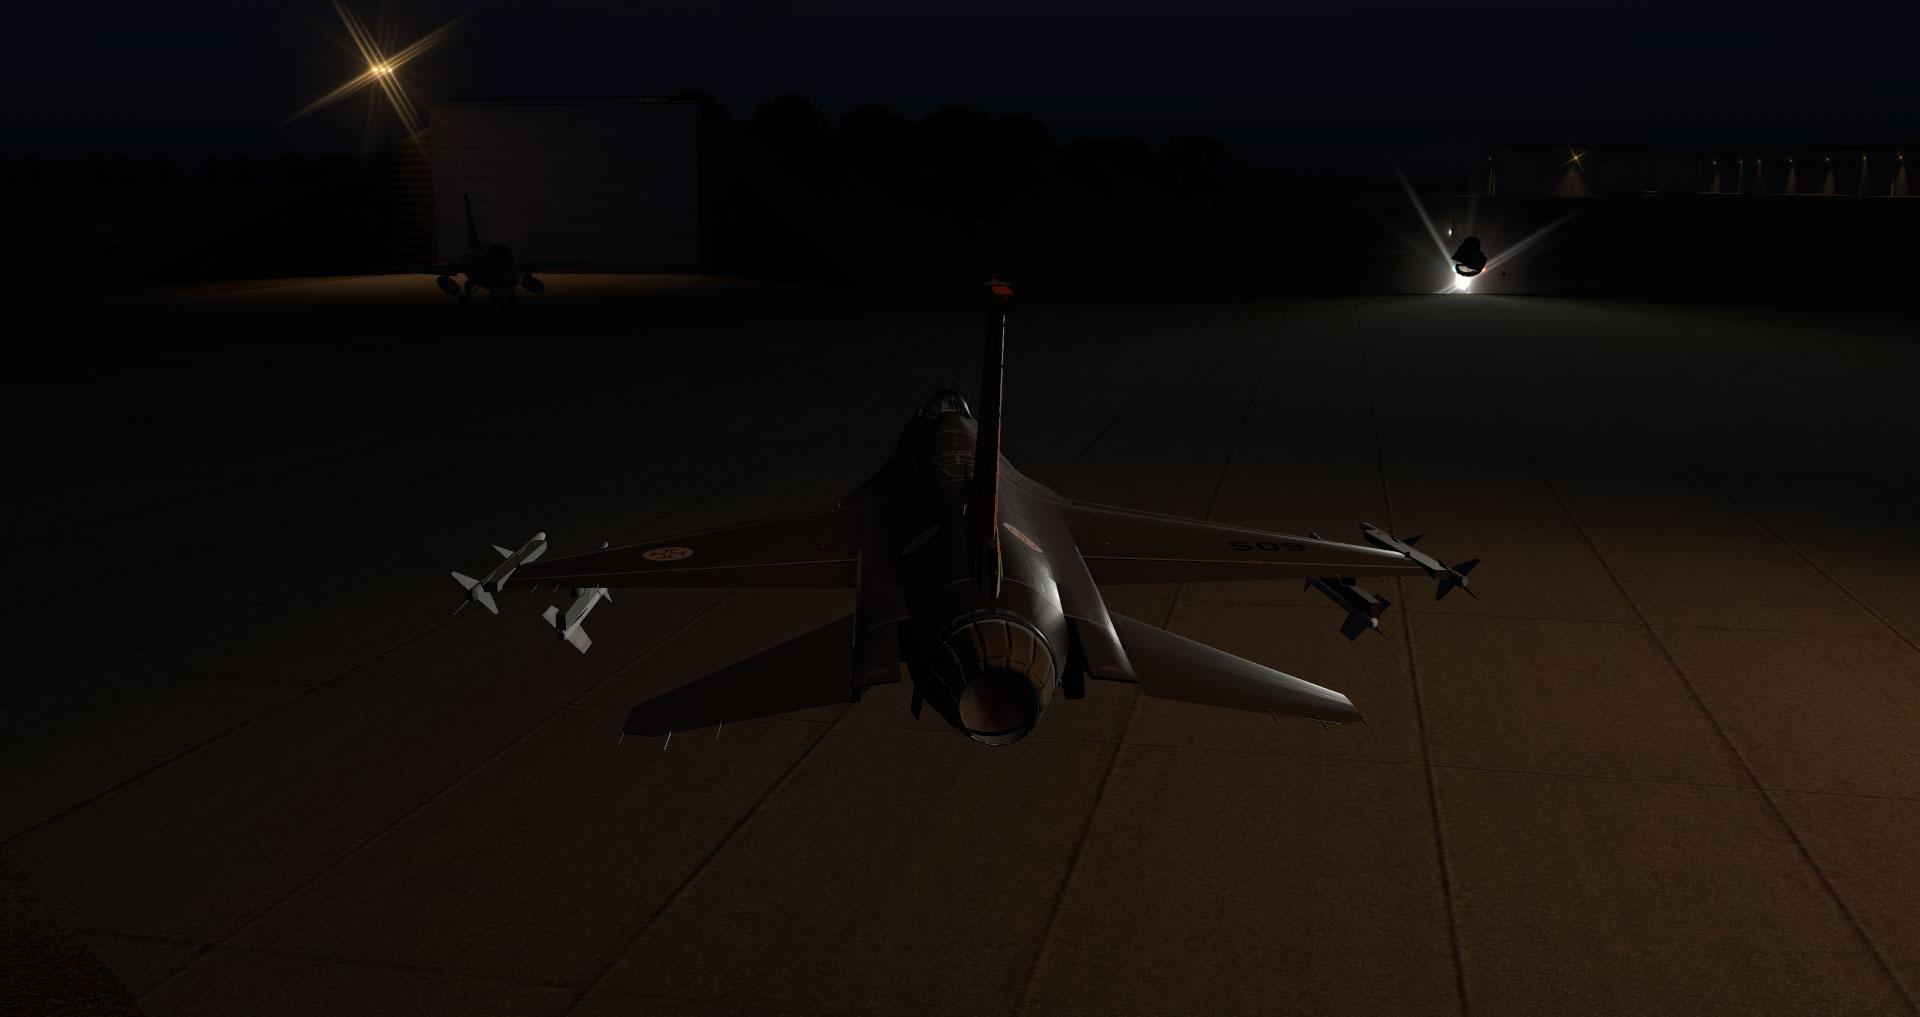 F_16---2021-03-21-17.19